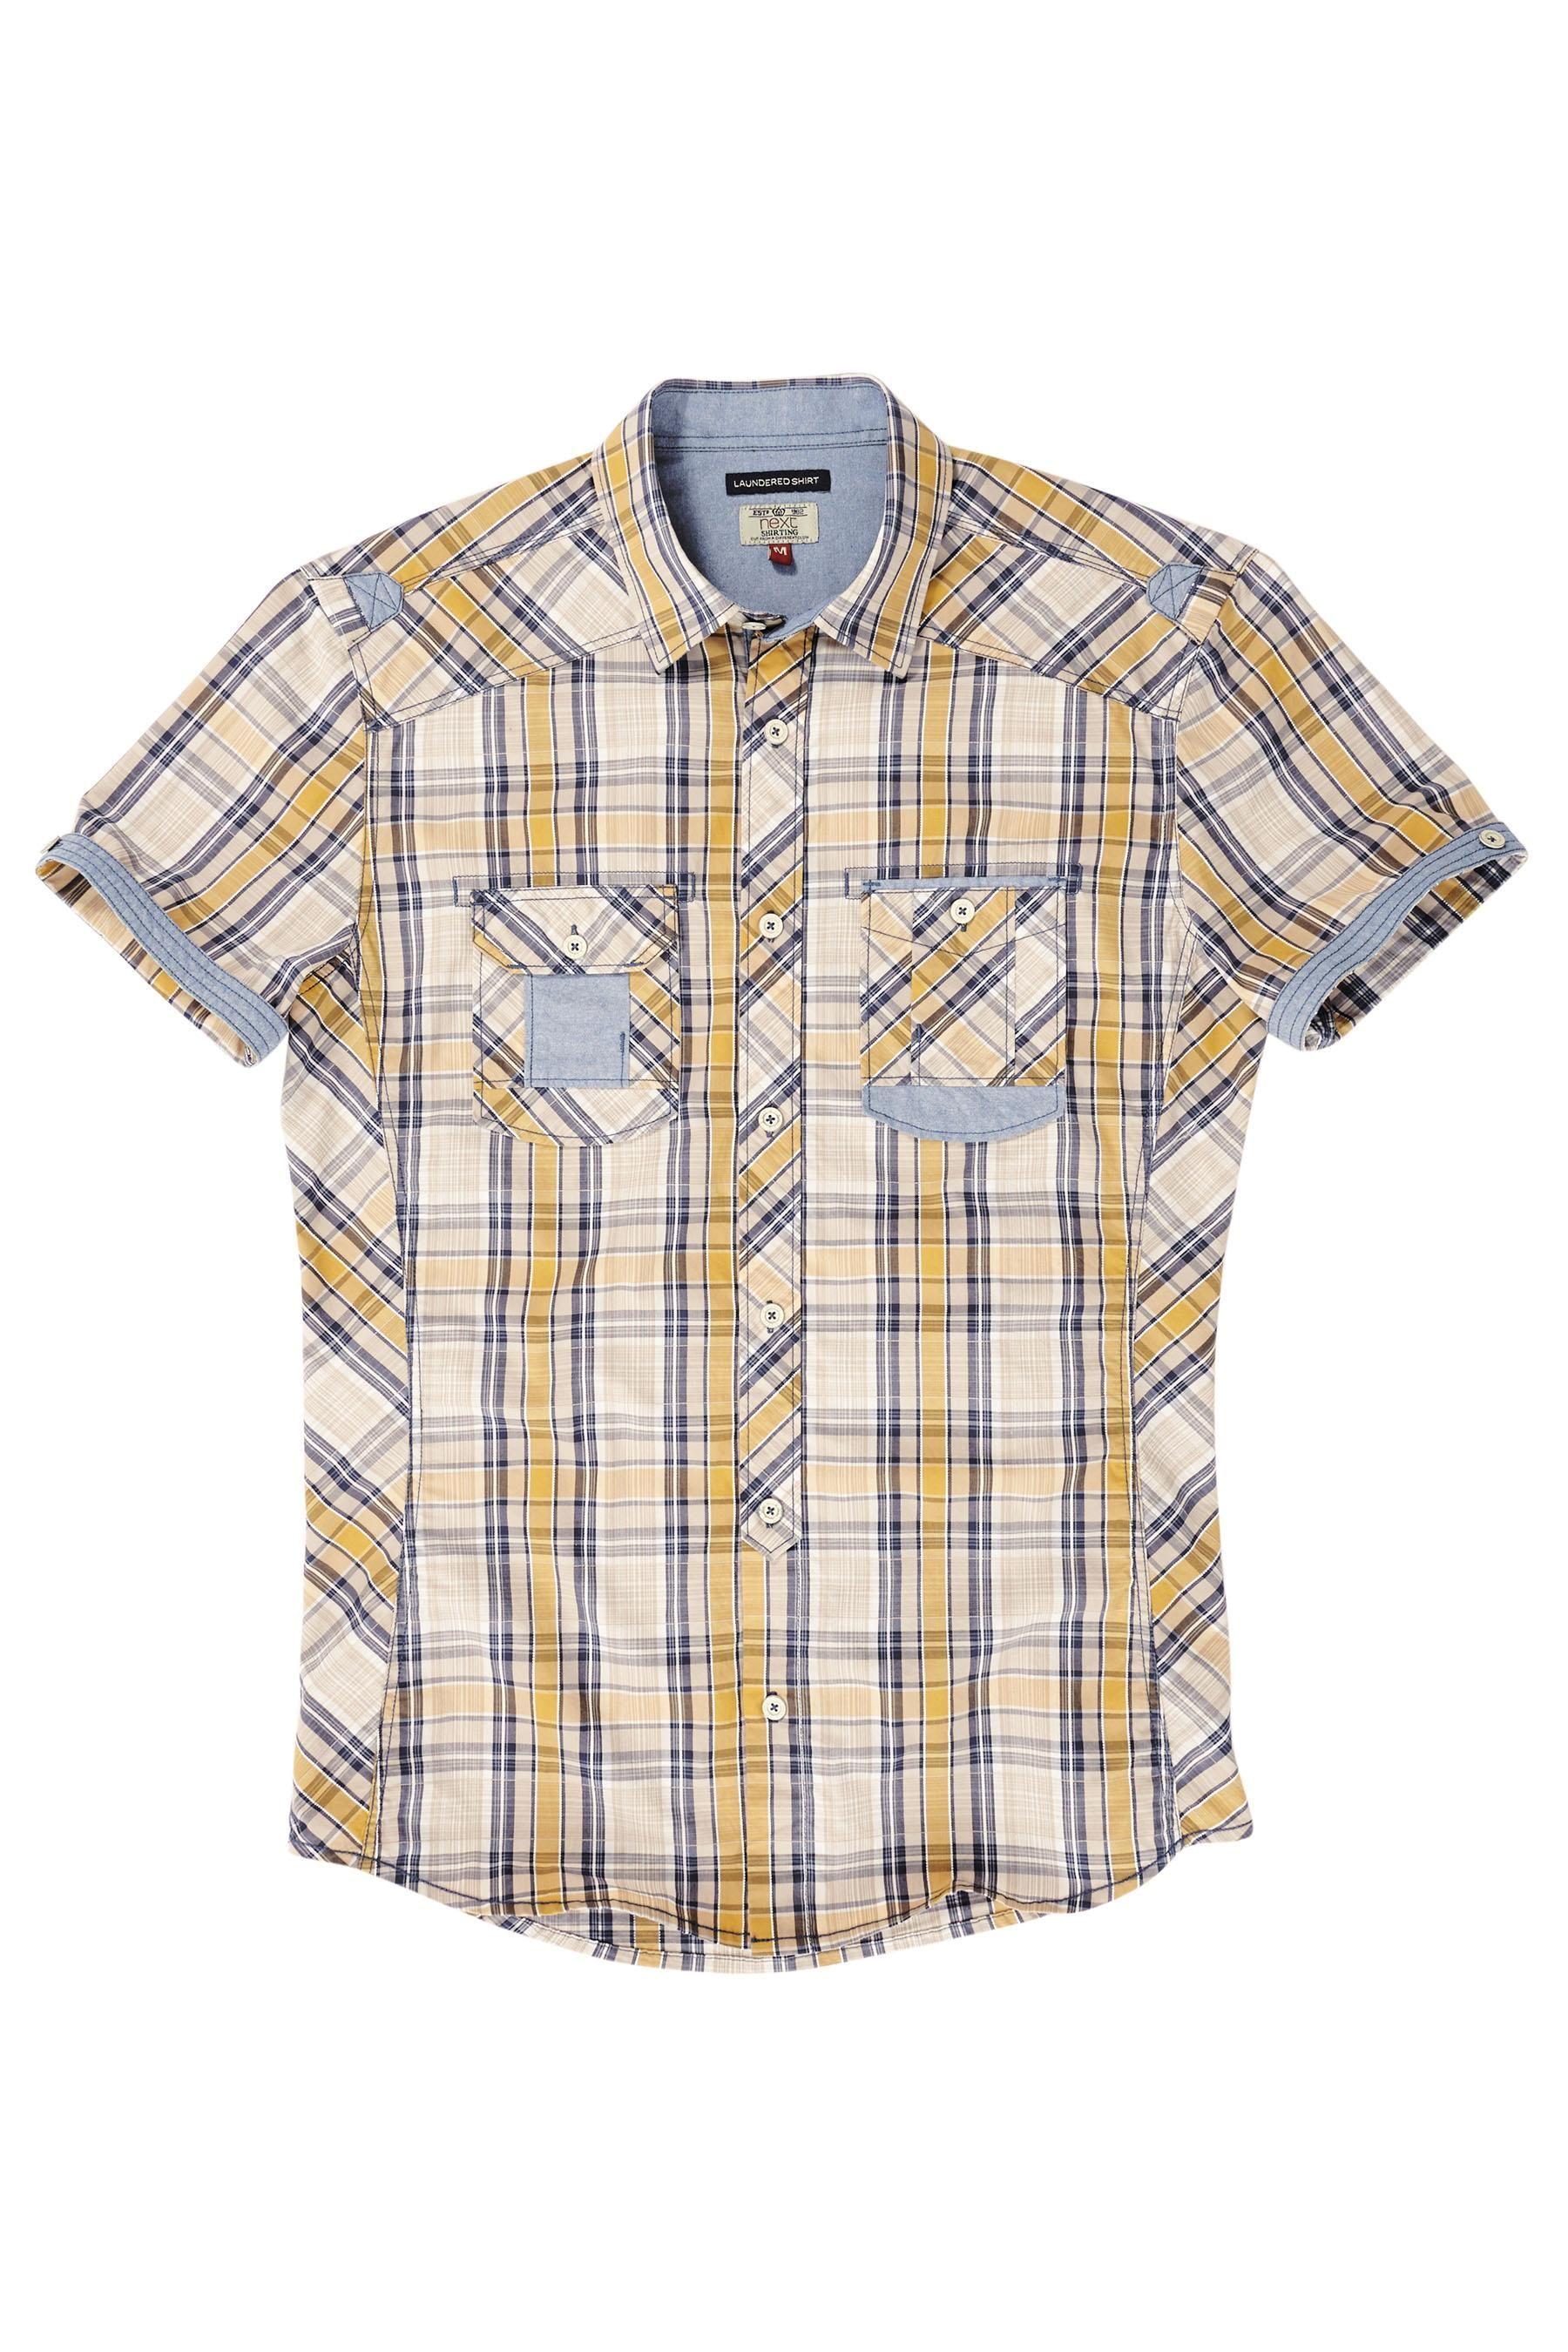 Buy Ecru Yellow Check Shirt from the Next UK online shop